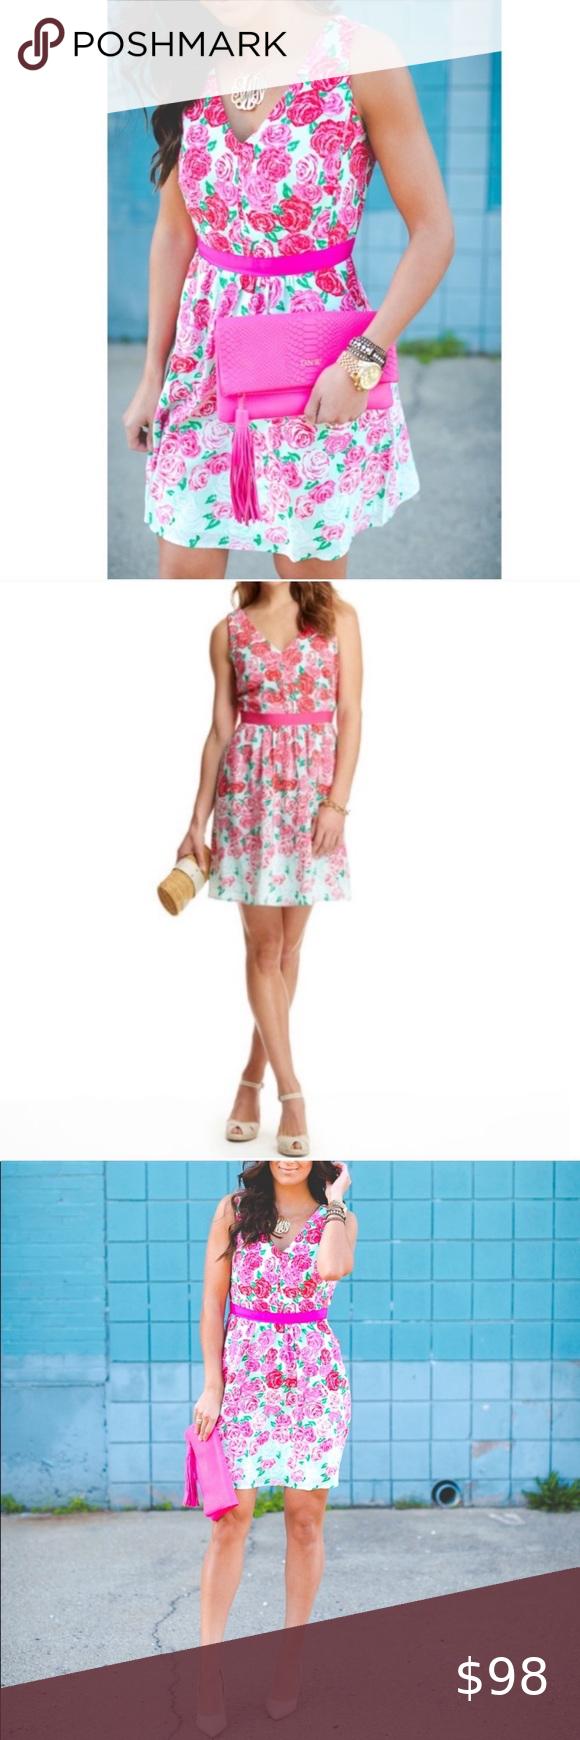 Vineyard Vines Run For The Roses Pink Dress 12 Vineyard Vines Run For The Roses Kentucky Derby Perfect Spring Summer Pink Dress Dresses Spring Summer Dress [ 1740 x 580 Pixel ]